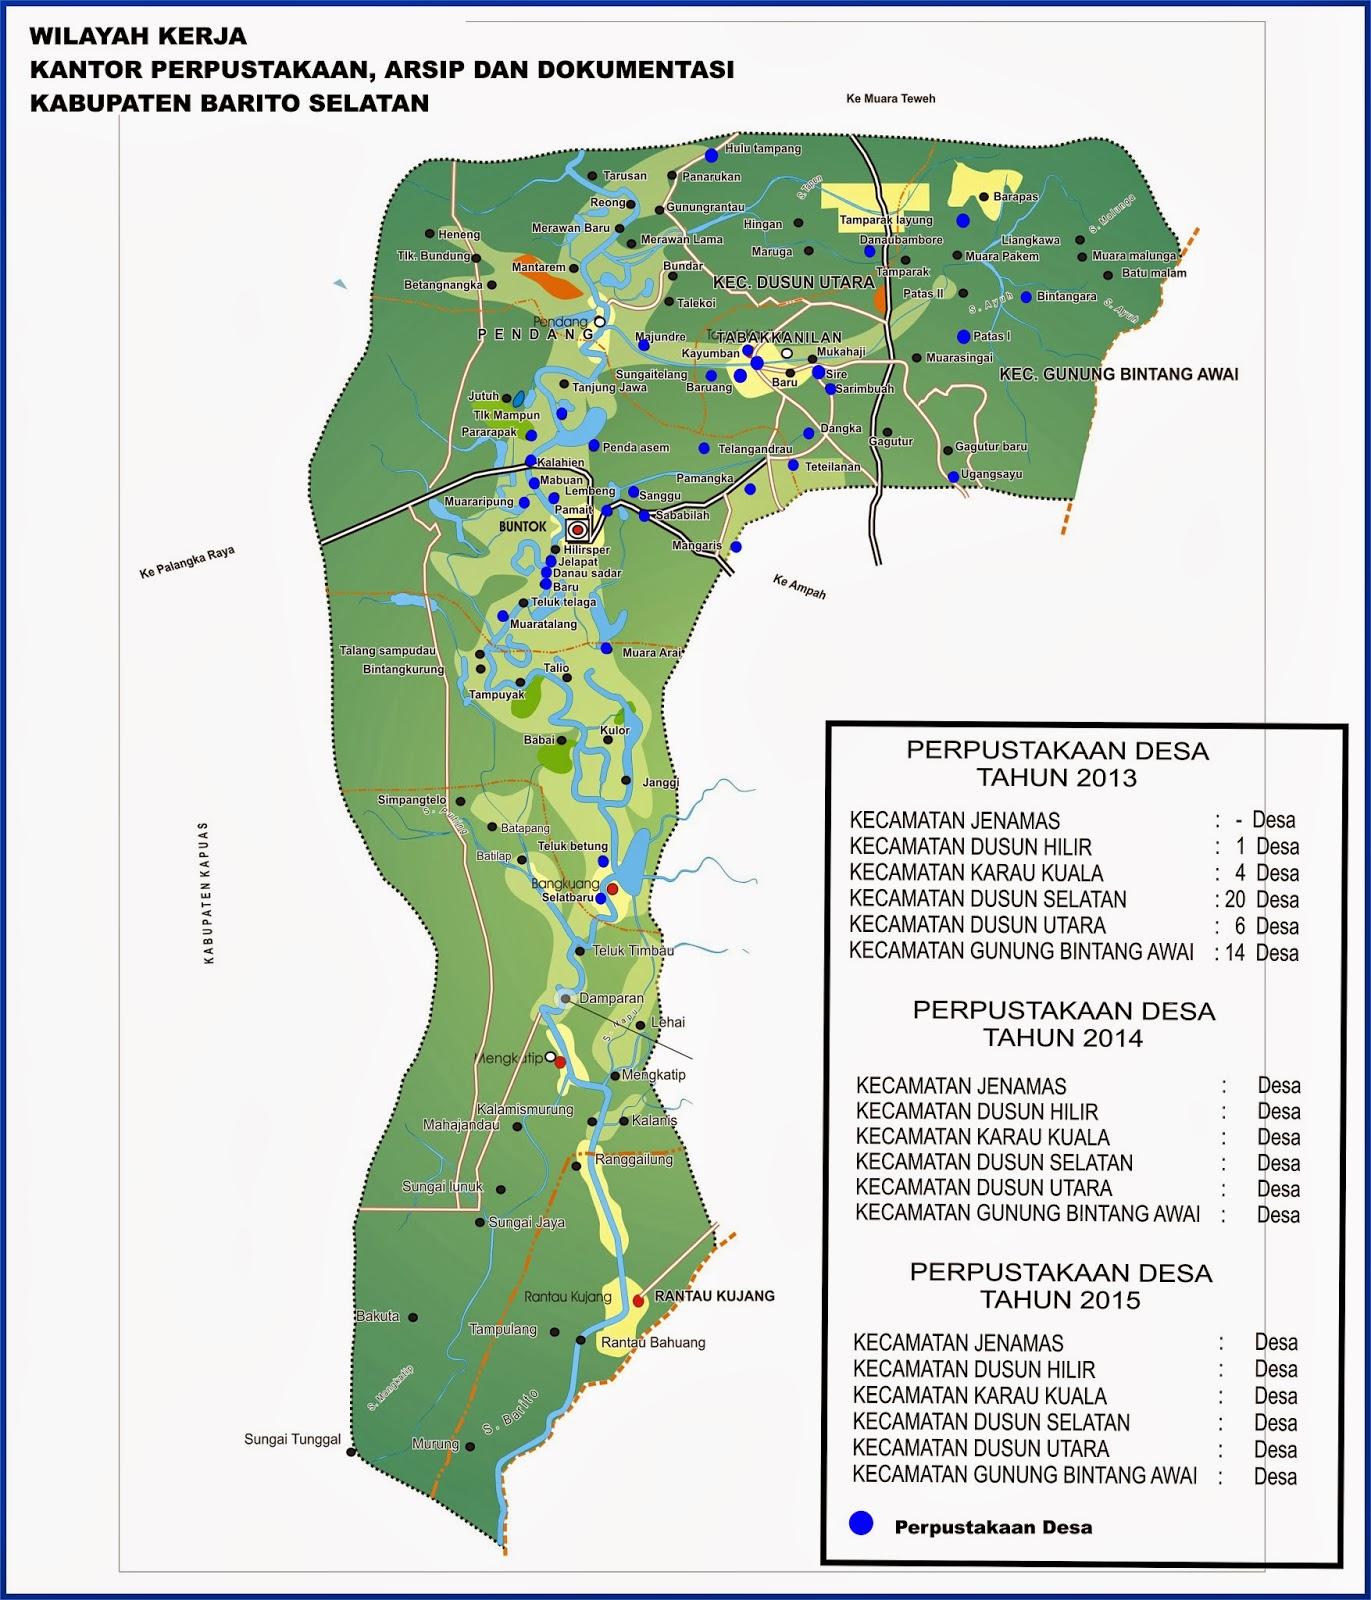 Peta Kota: Peta Kabupaten Barito Selatan